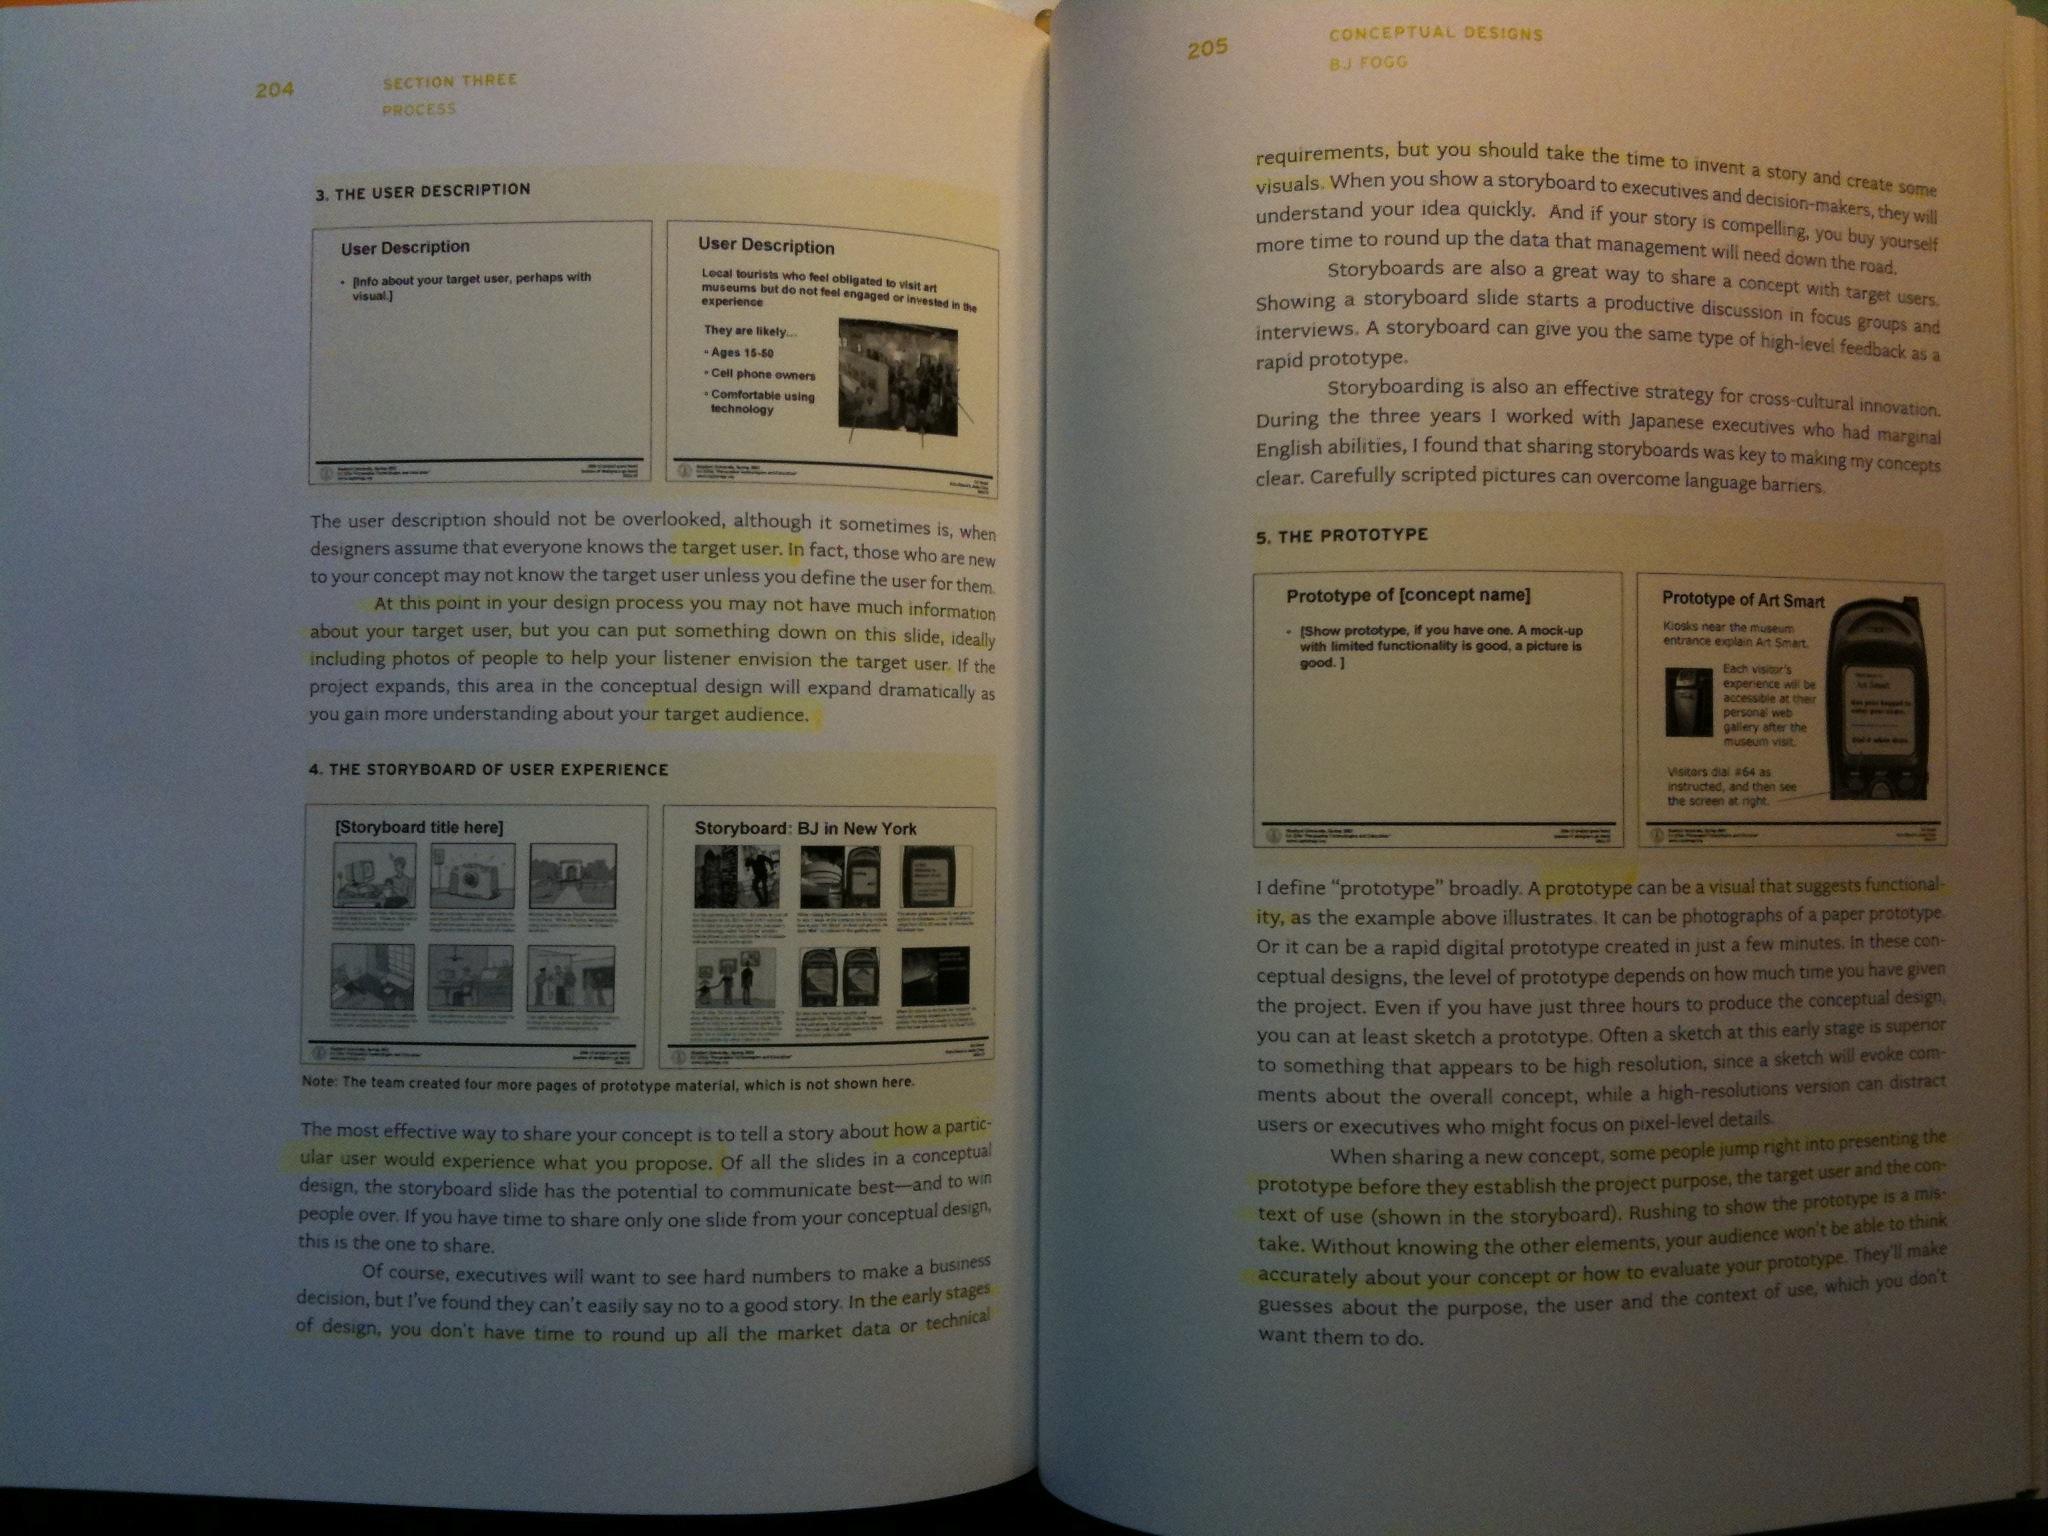 via Brenda Laurel, Design Research (MIT Press 2003): 204-5